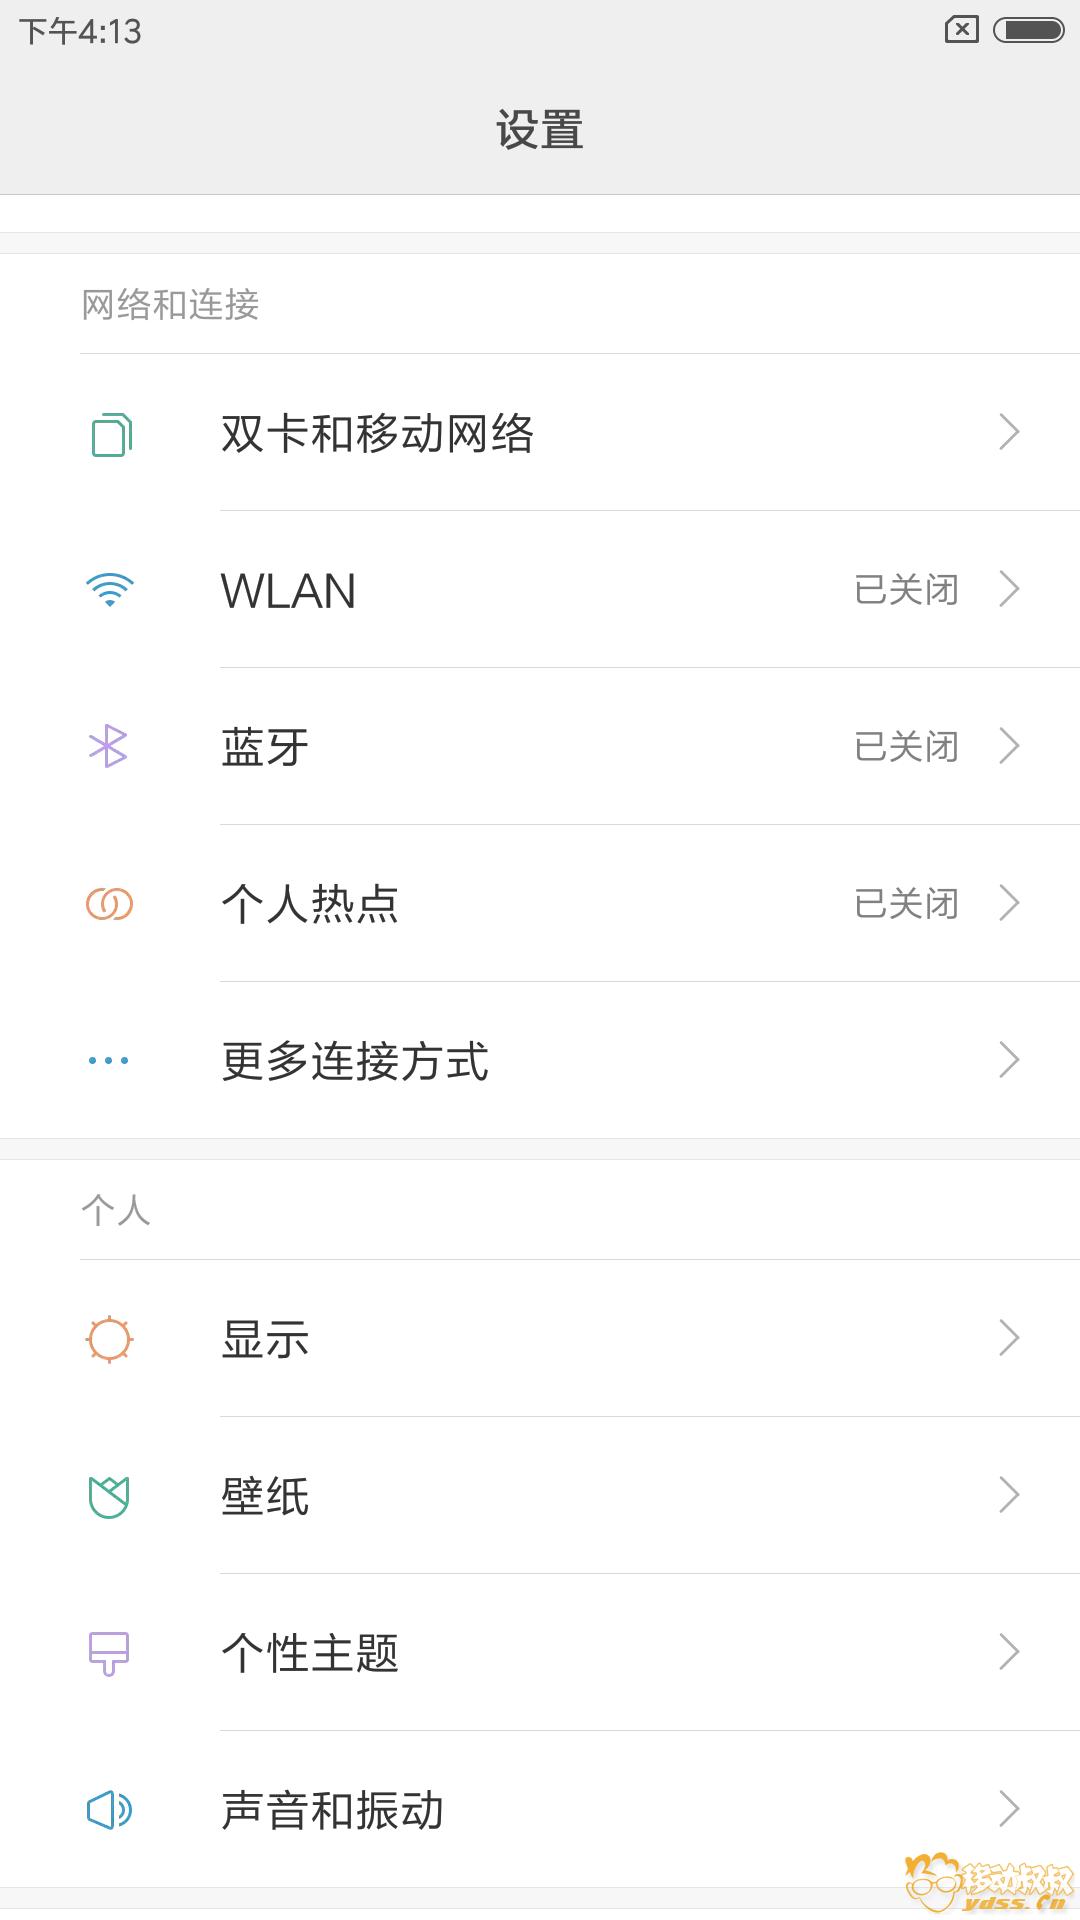 Screenshot_2018-01-13-16-13-07-239_com.android.settings.png